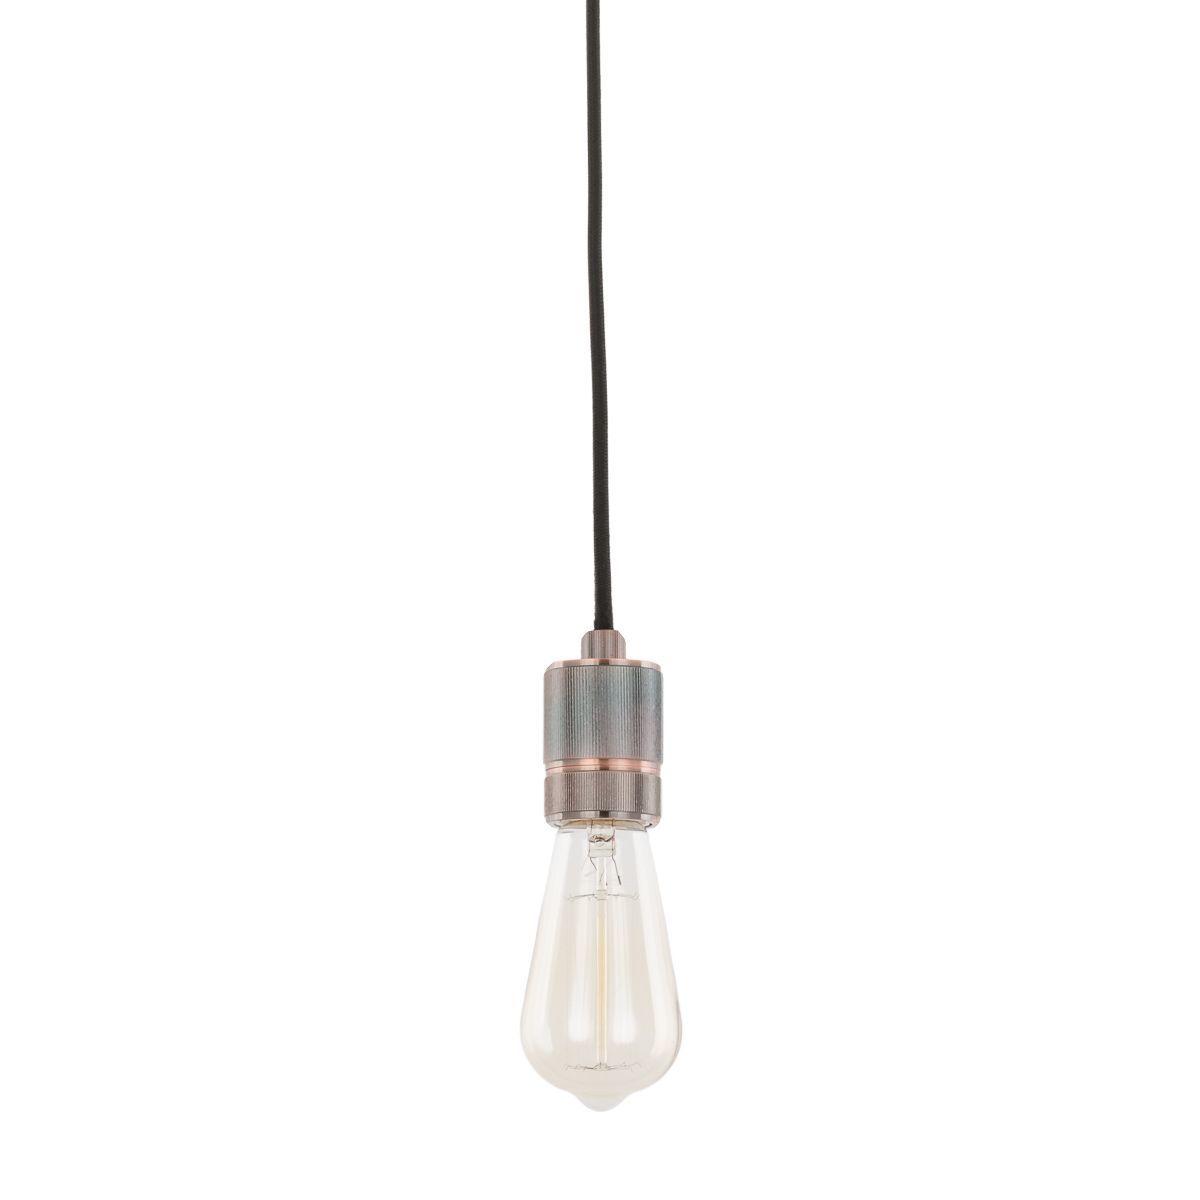 ITALUX LAMPA ZWIS CASA DS-M-010 RED COPPER